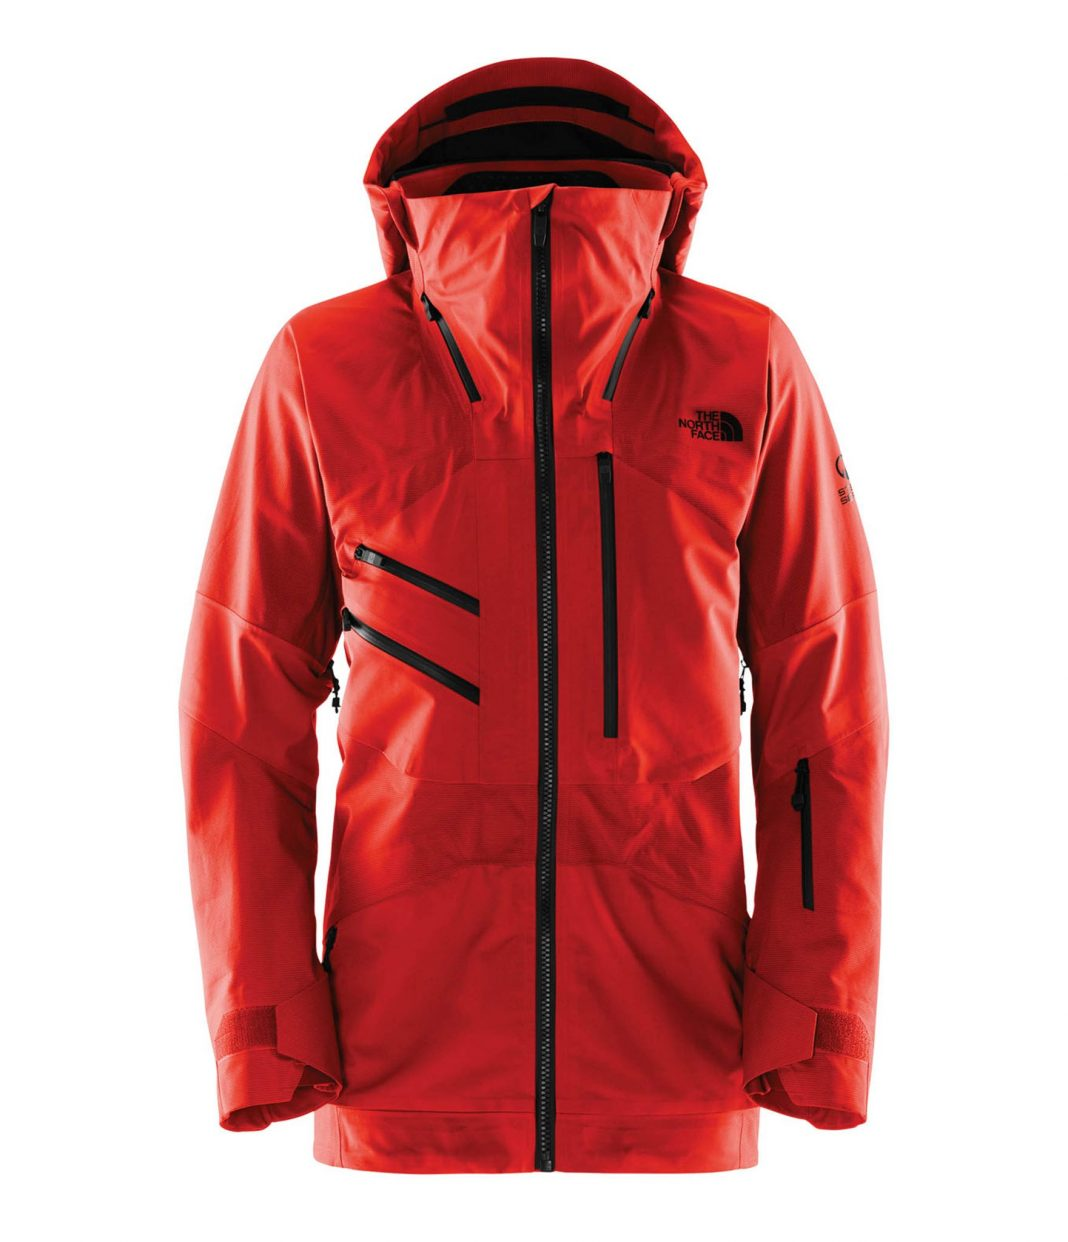 The North Face: Fuse Brigadine Jacket 18/19